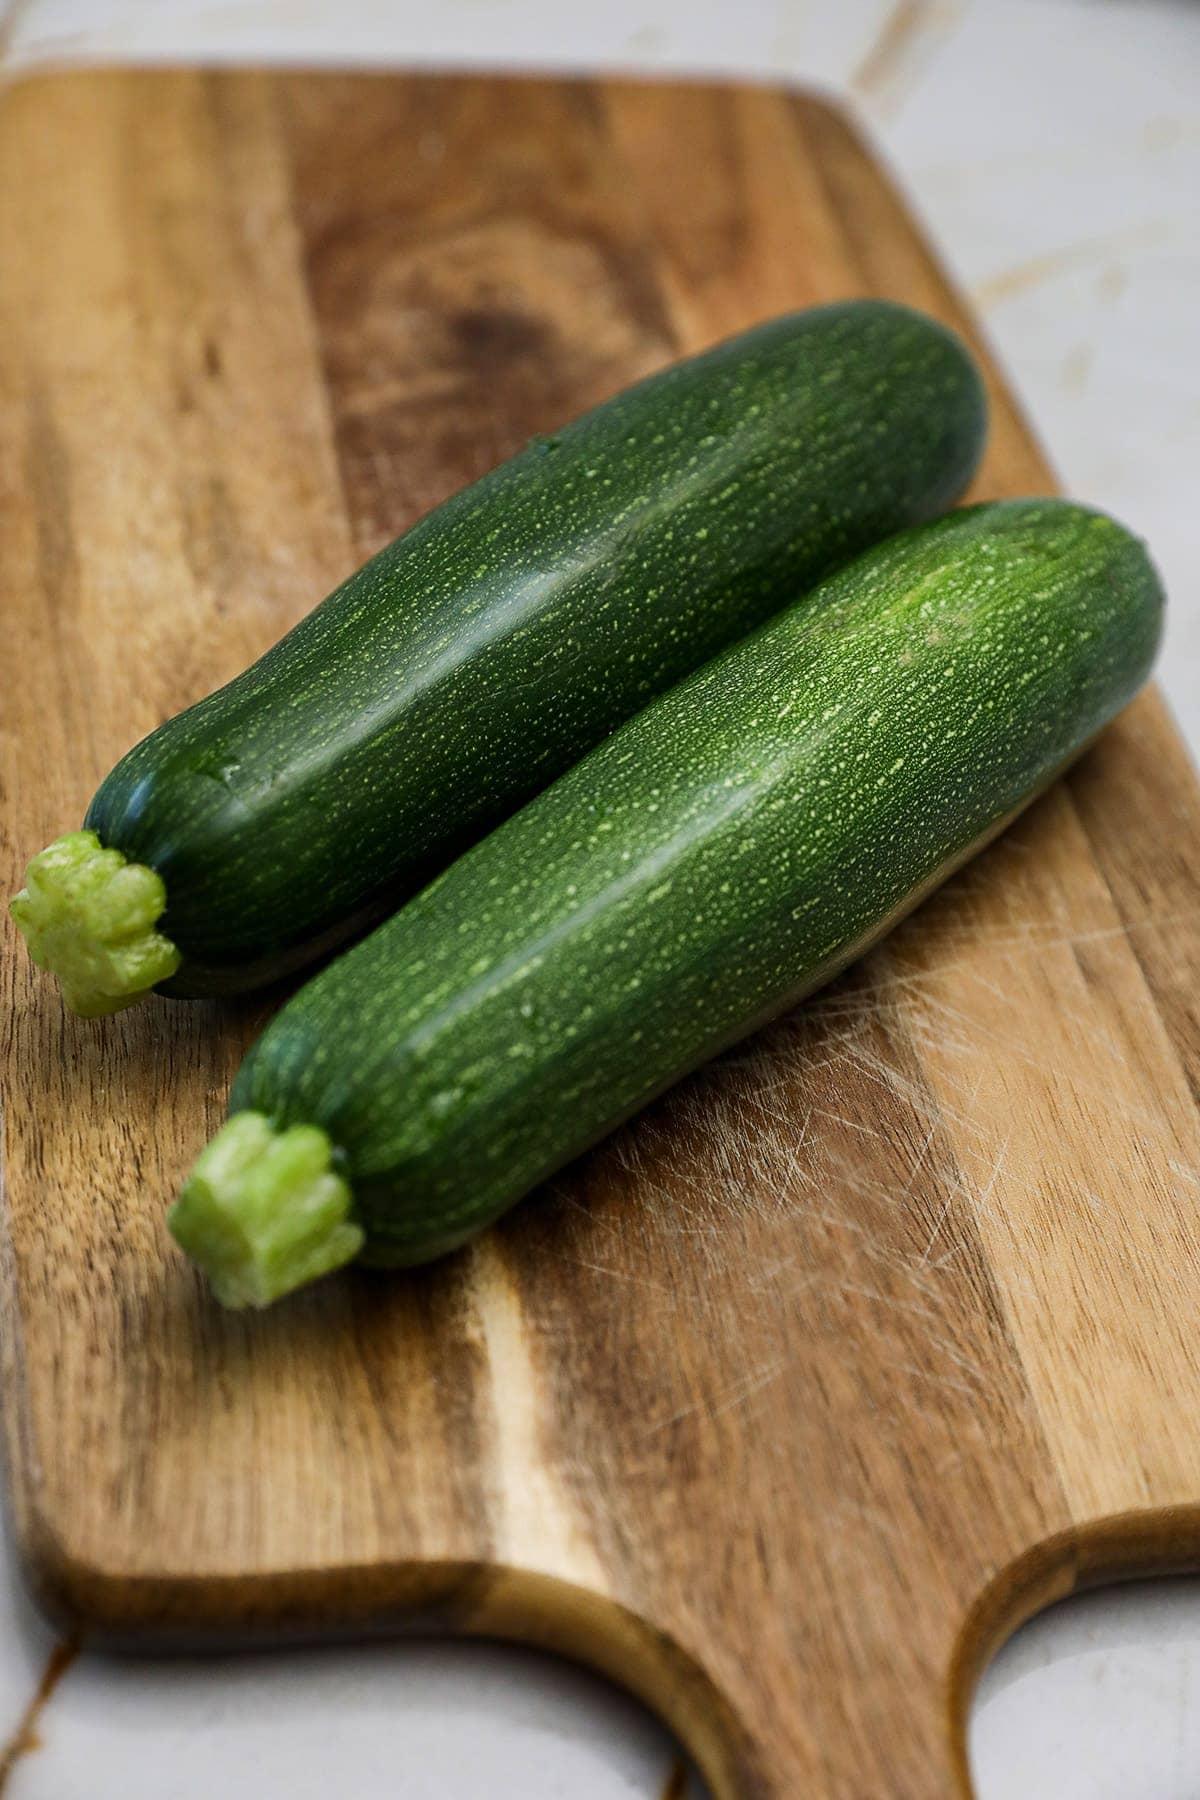 zucchini on wooden cutting board